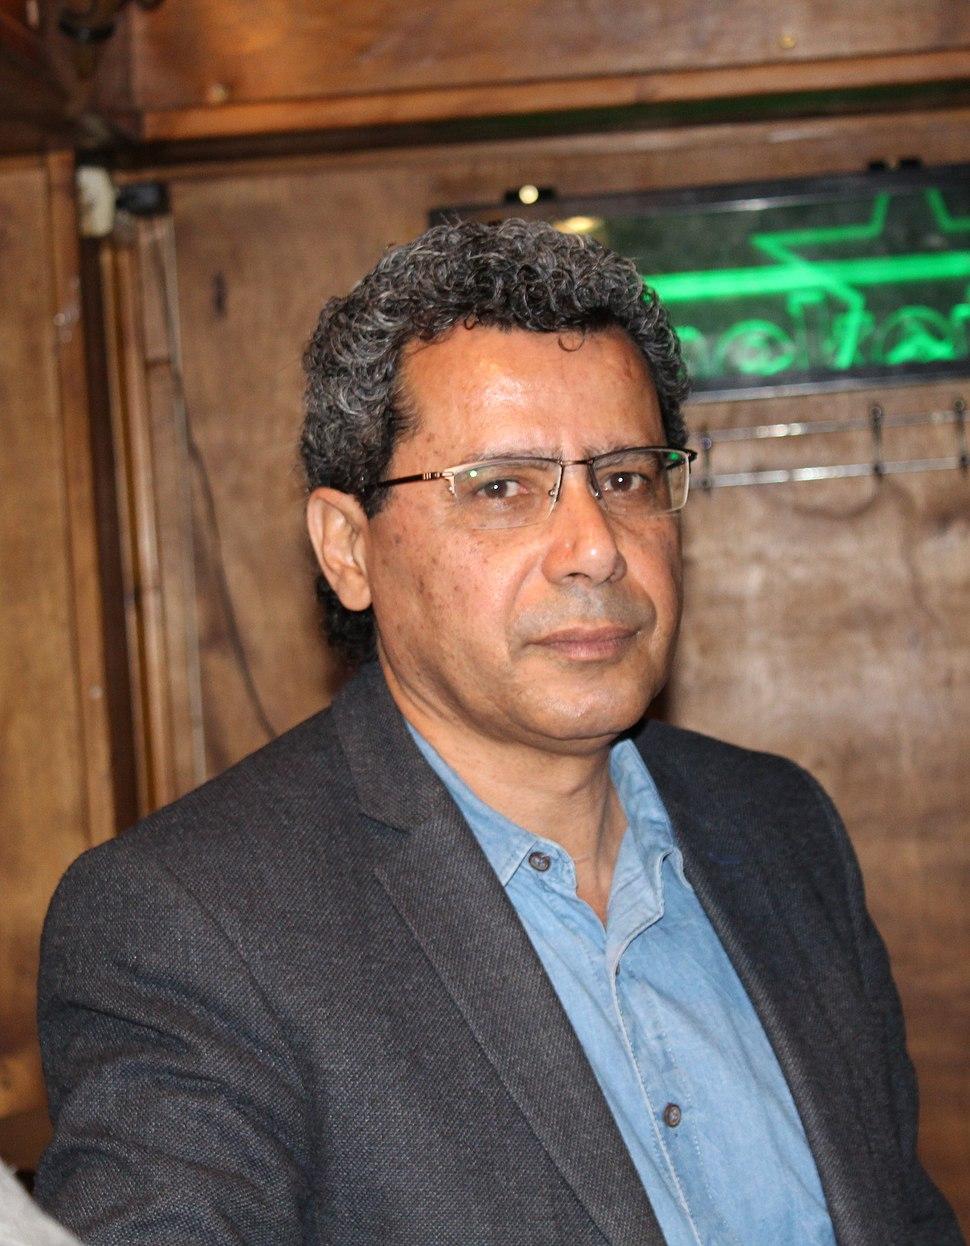 Yoav Yitzhak